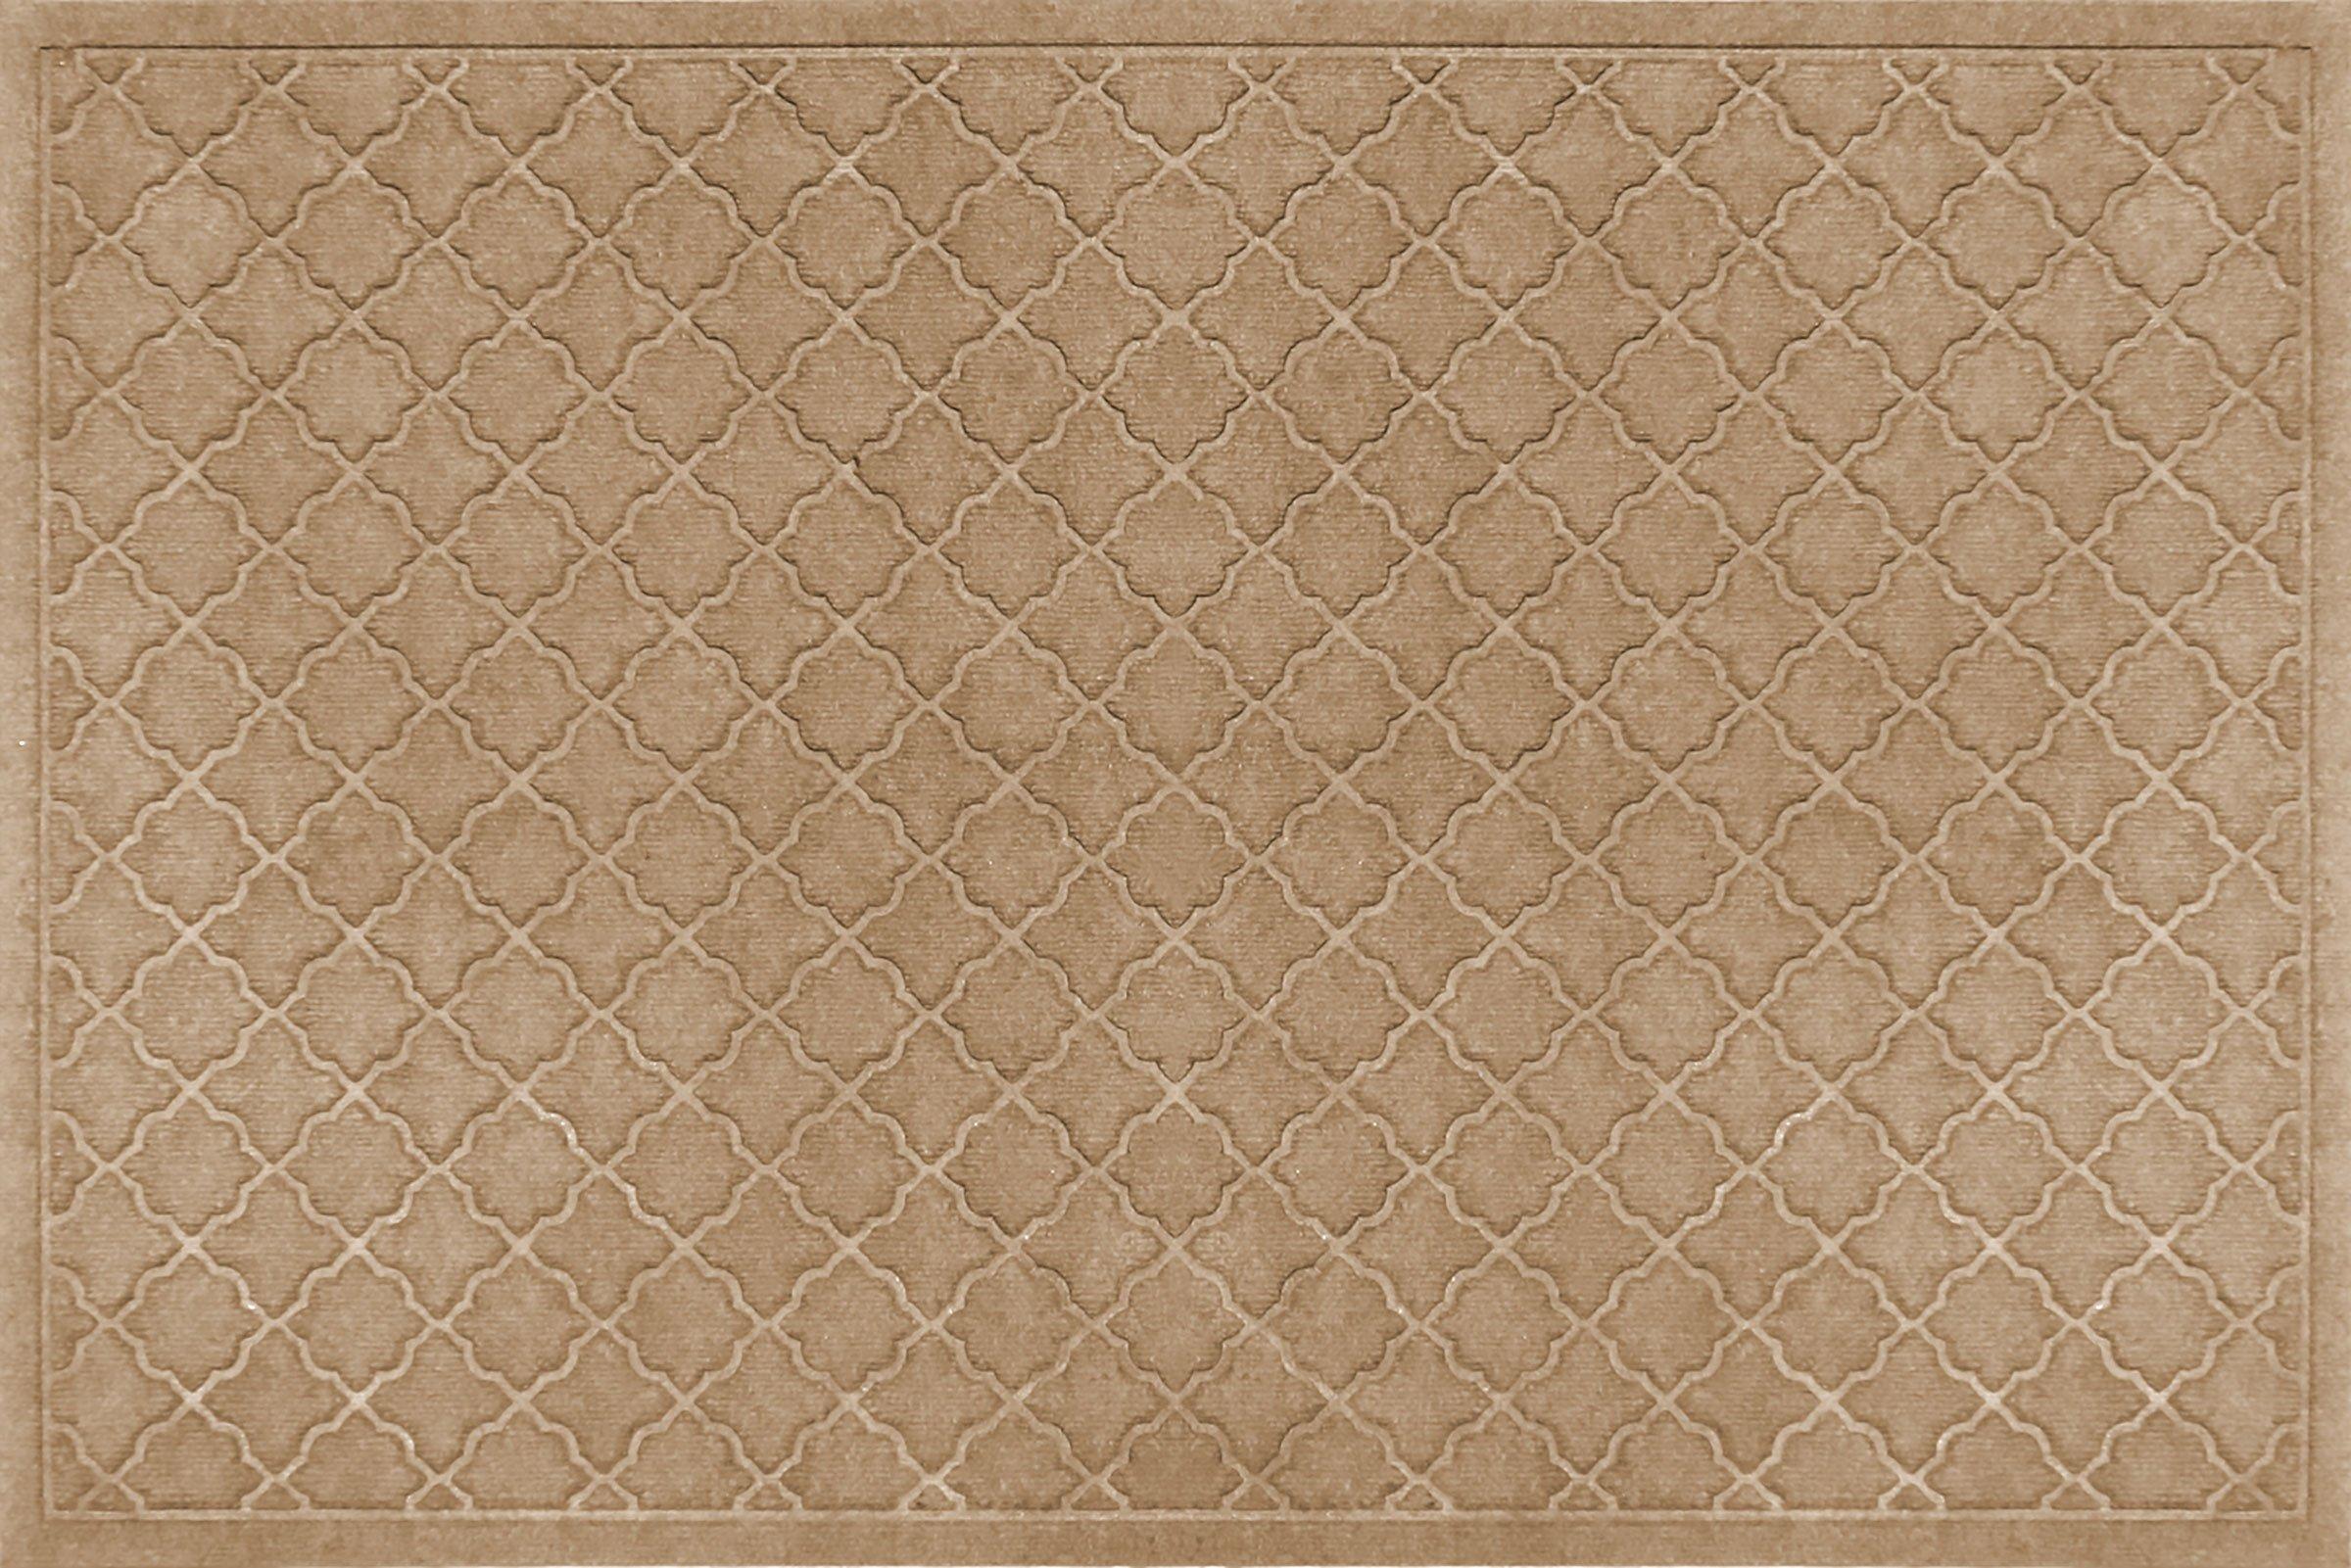 Bungalow Flooring Waterhog Doormat, 3' x 5', Skid Resistant, Easy to Clean, Catches Water and Debris, Cordova Collection, Khaki